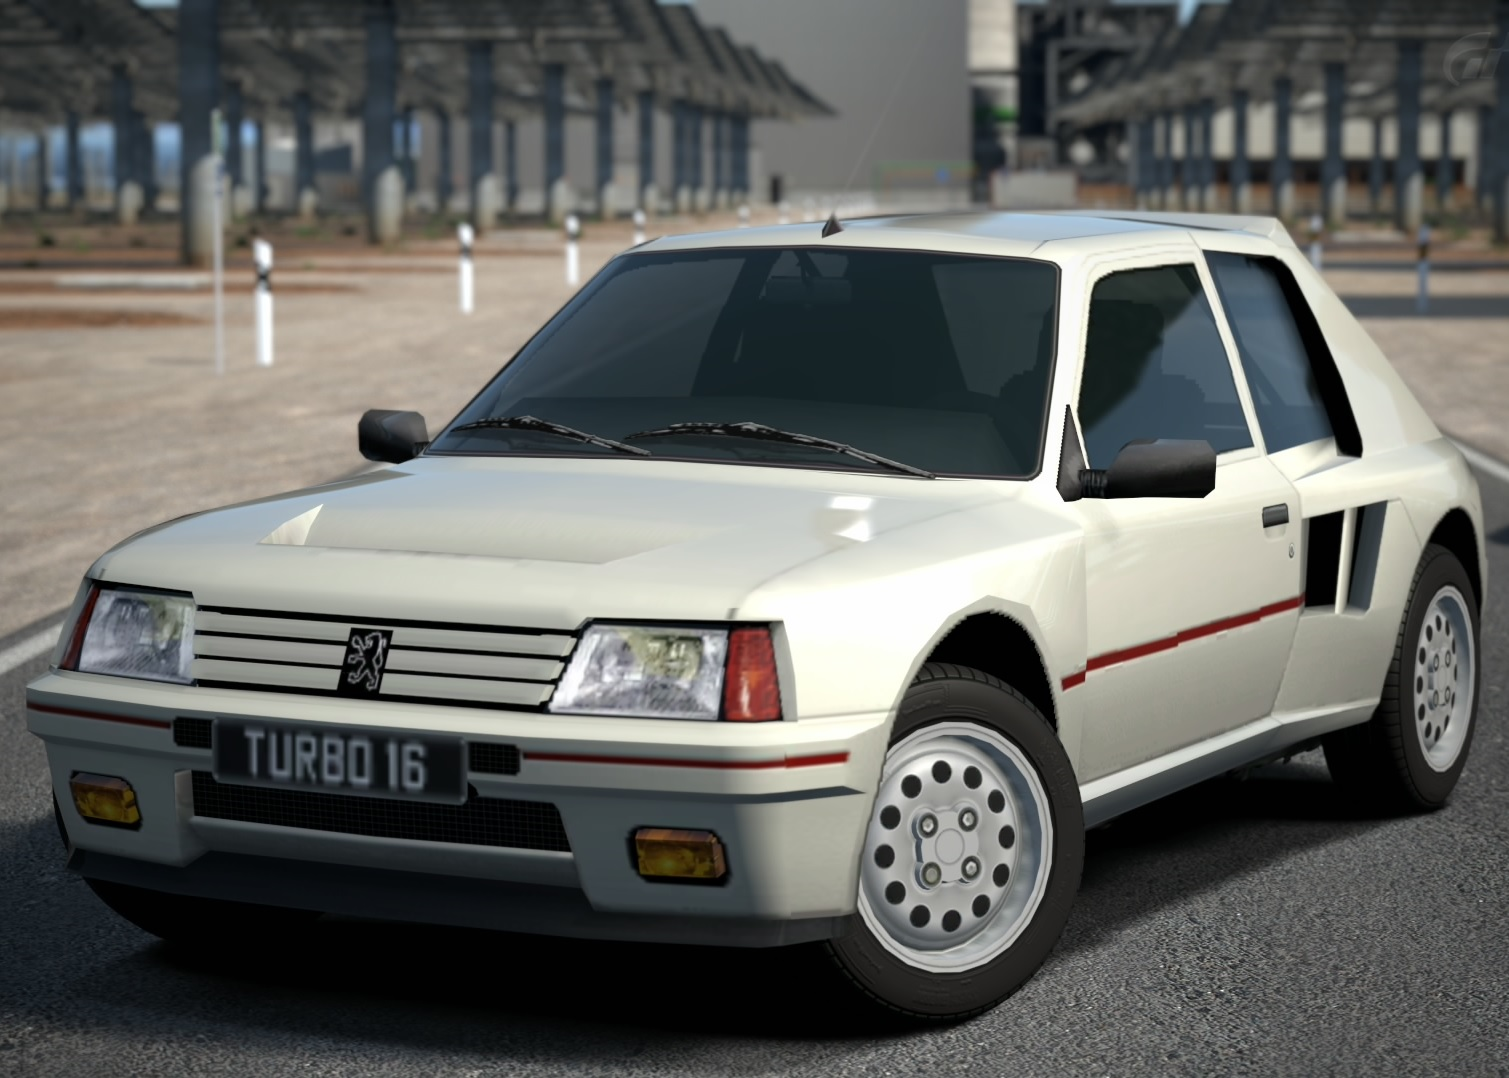 peugeot 205 turbo 16 '85 | gran turismo wiki | fandom poweredwikia